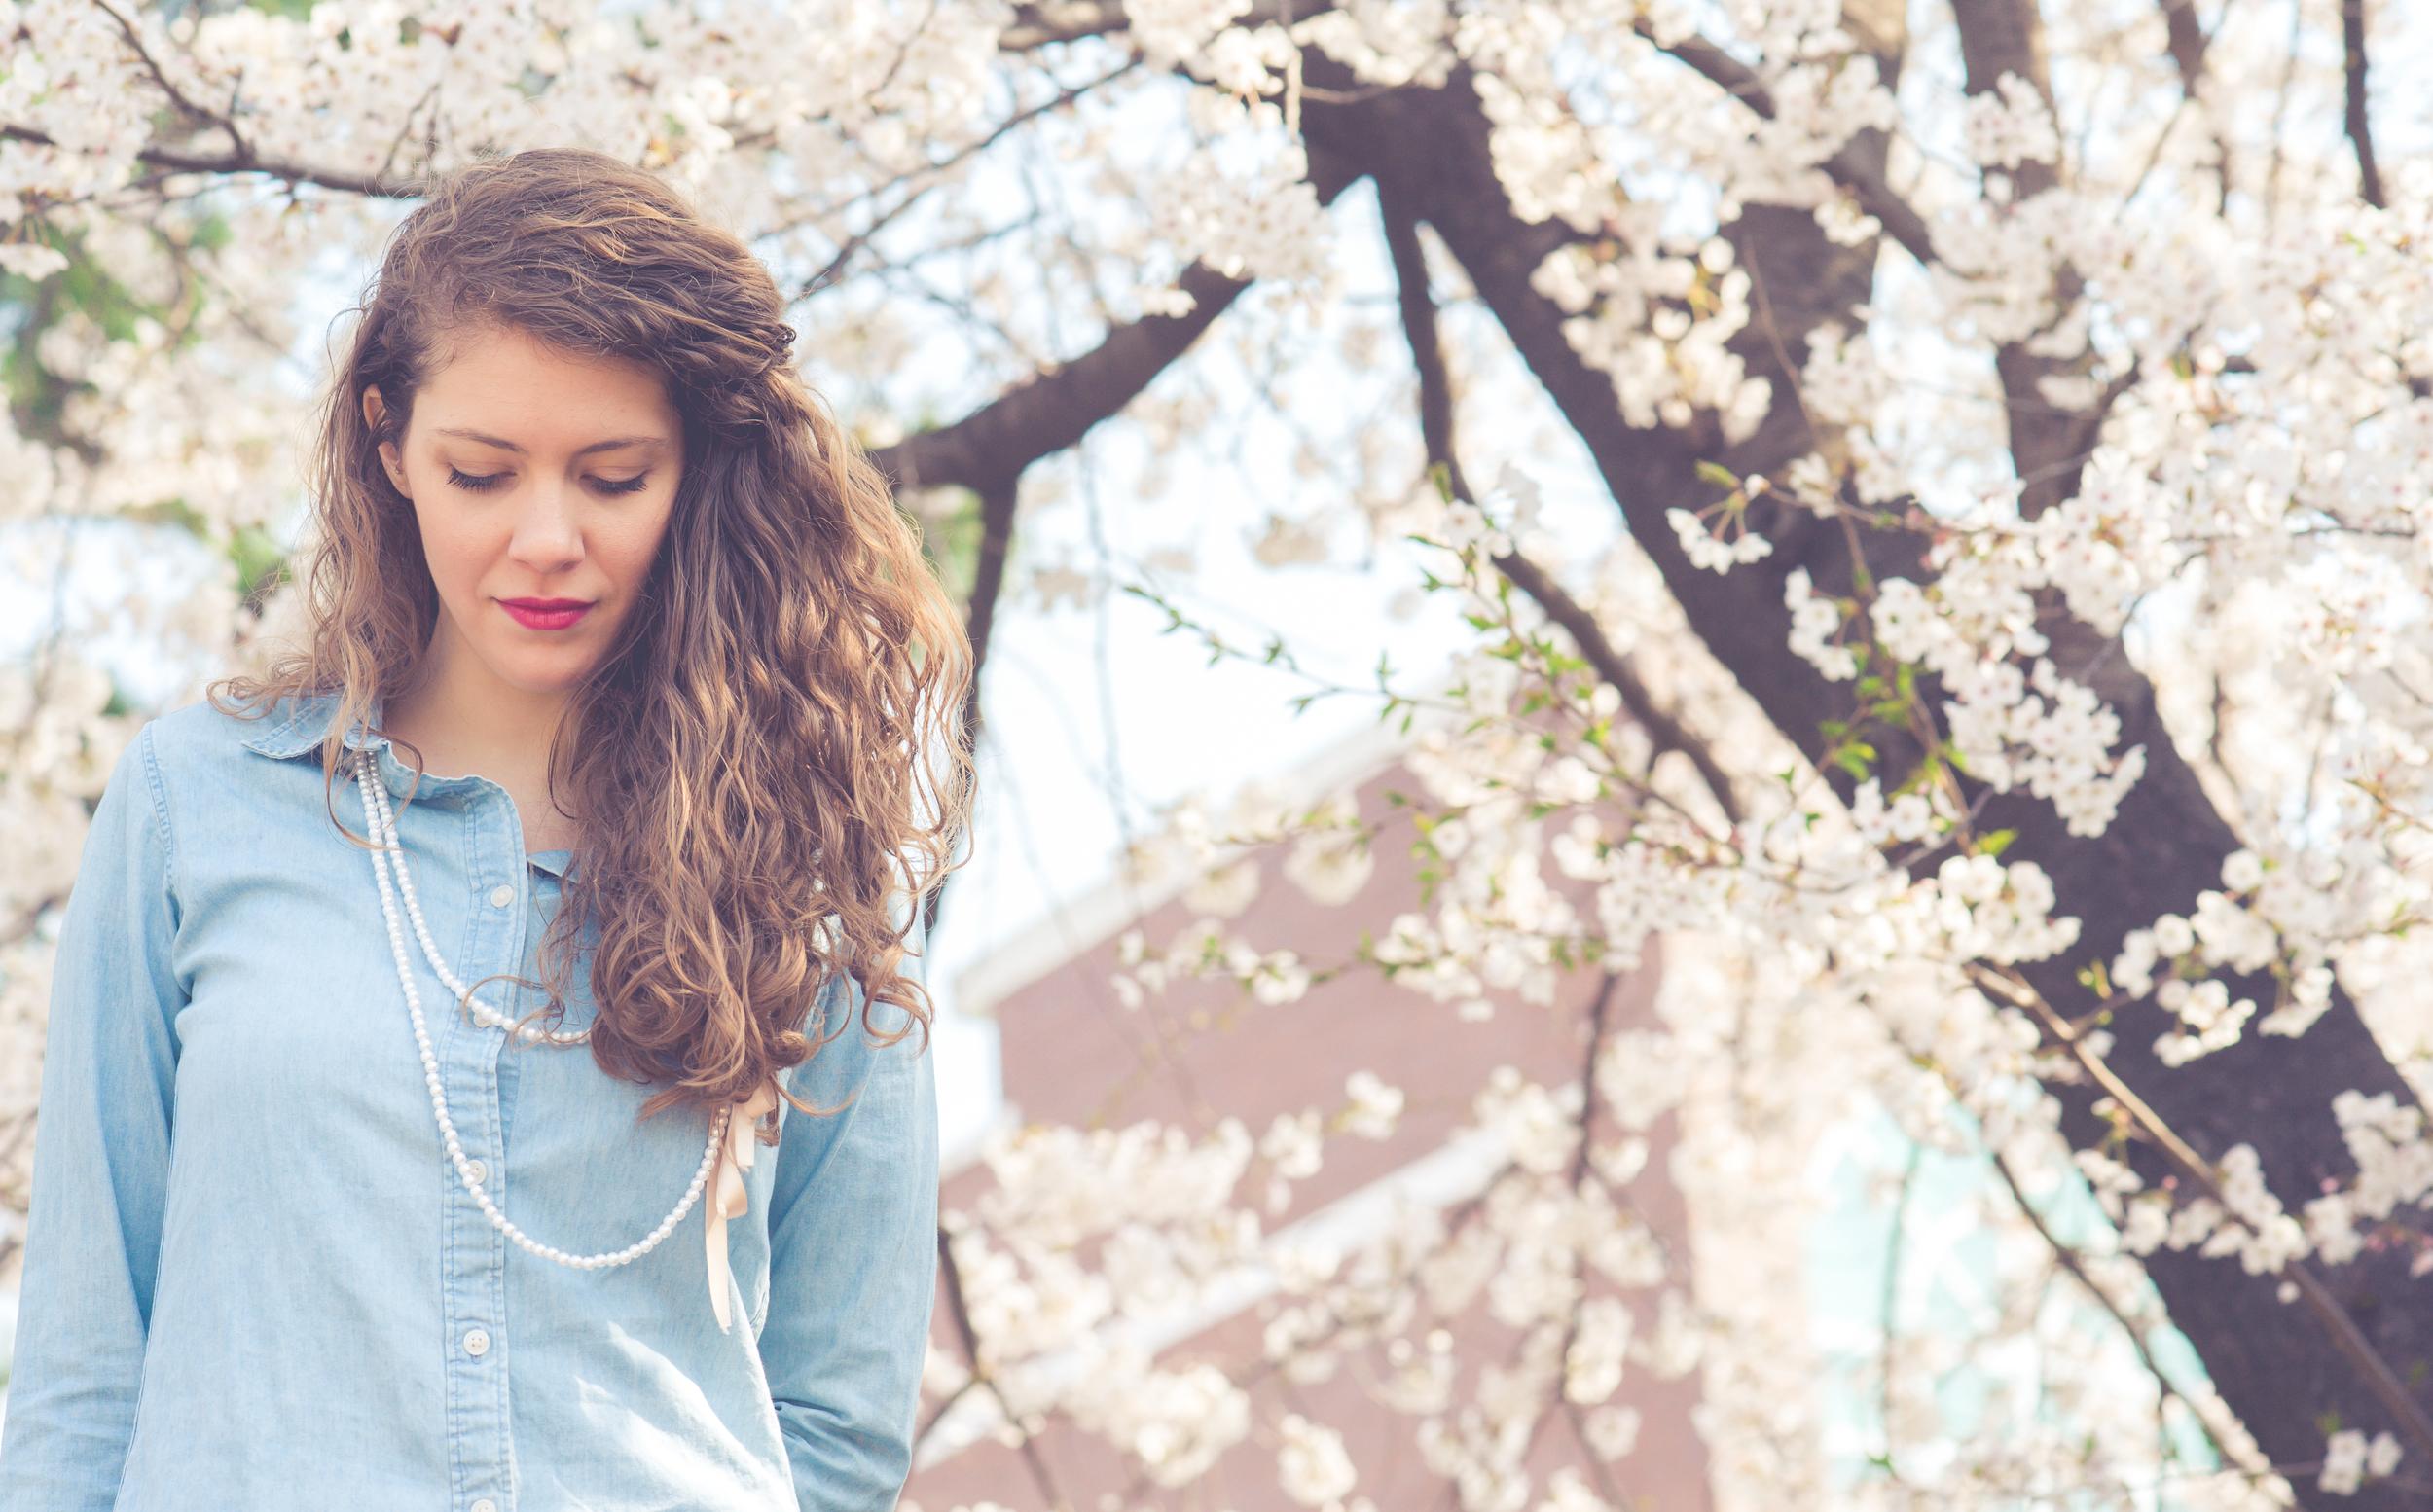 CherryBlossomStyledShootKoreaAlyshaCGSPhotography (43 of 57).jpg